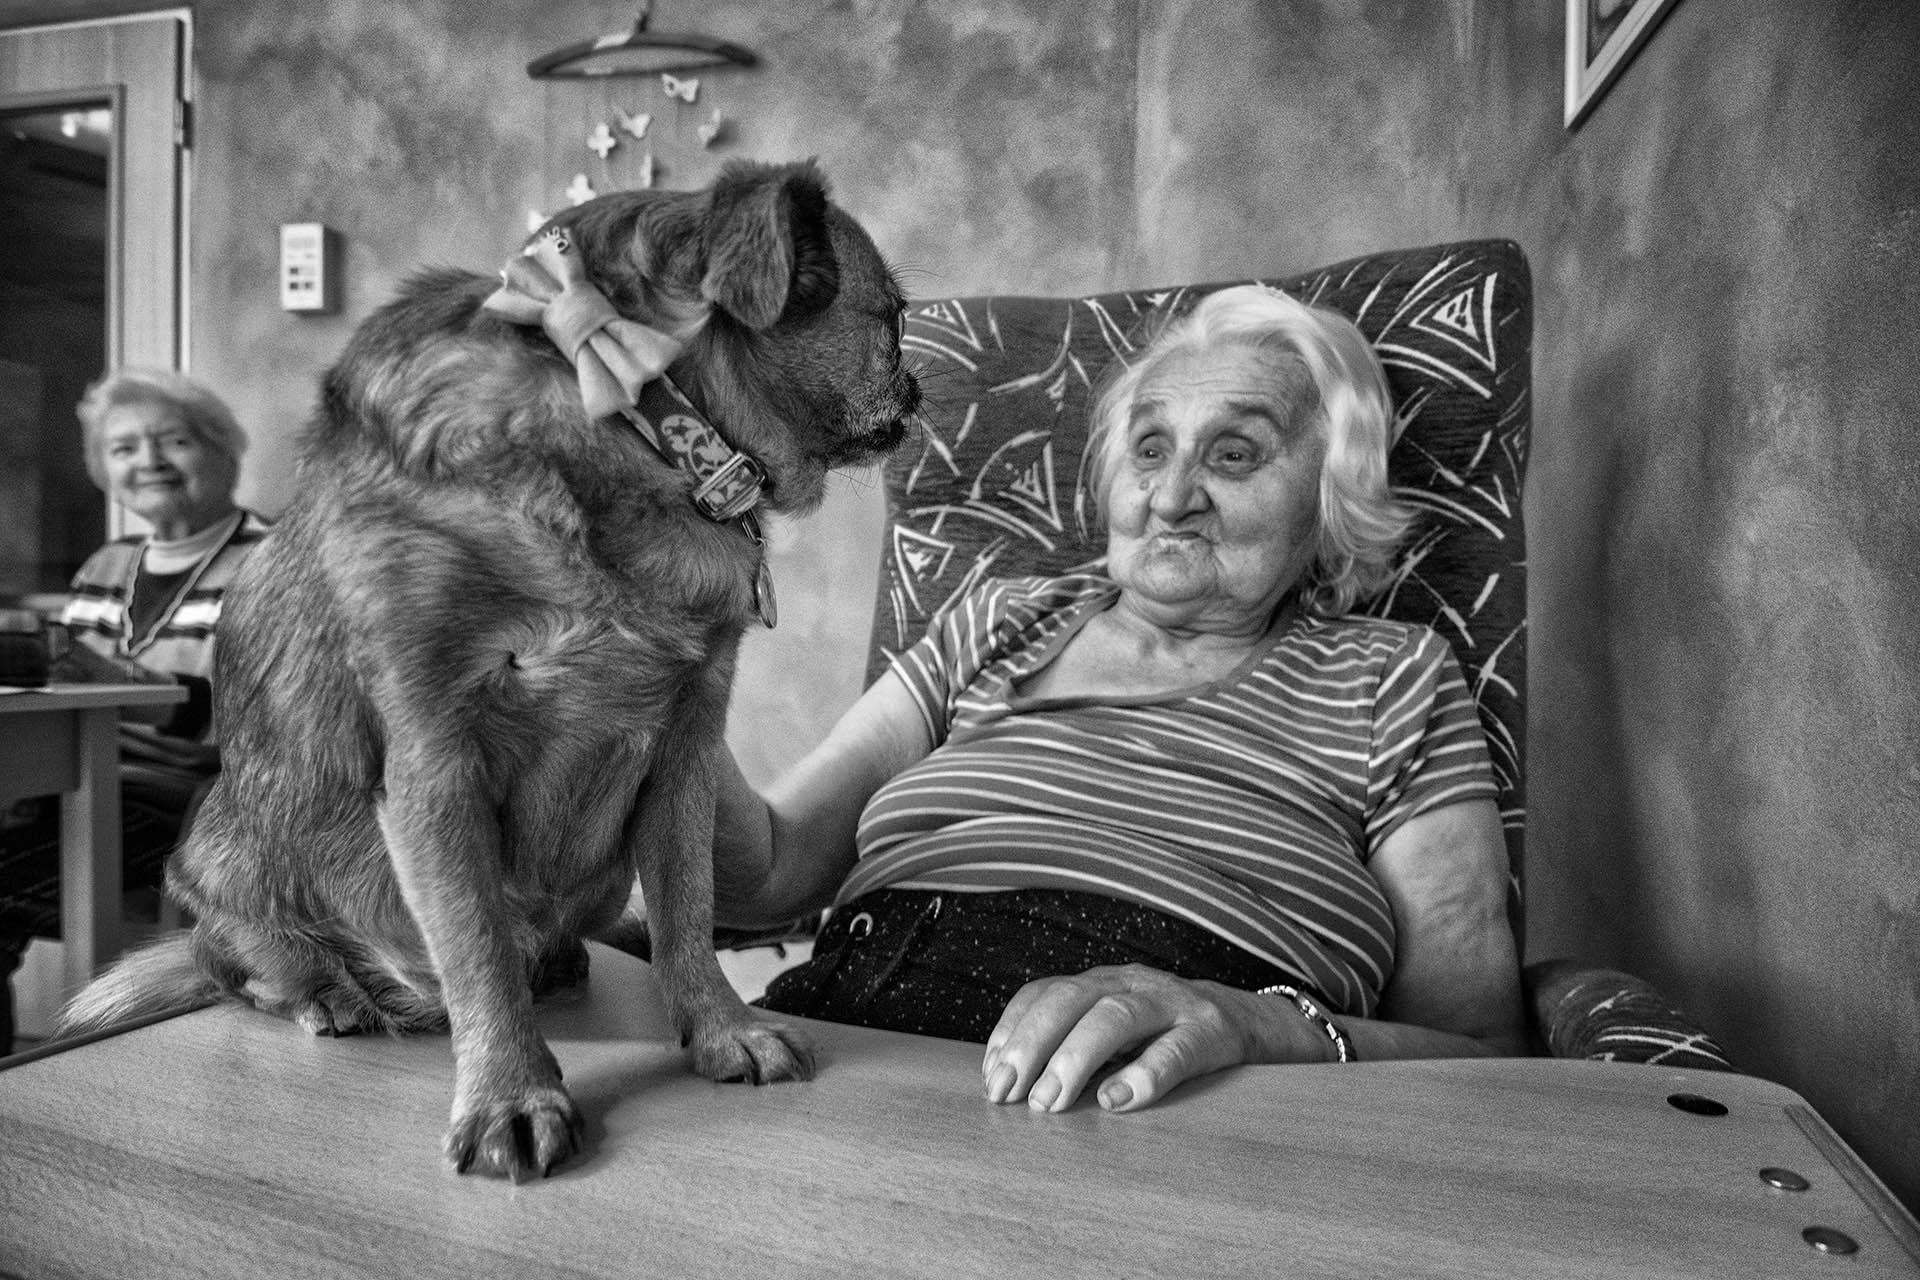 [CPC/deti4_jirkovsky-jan_186_canis-terapie-v-domove-knezny-emmy_006.jpg]